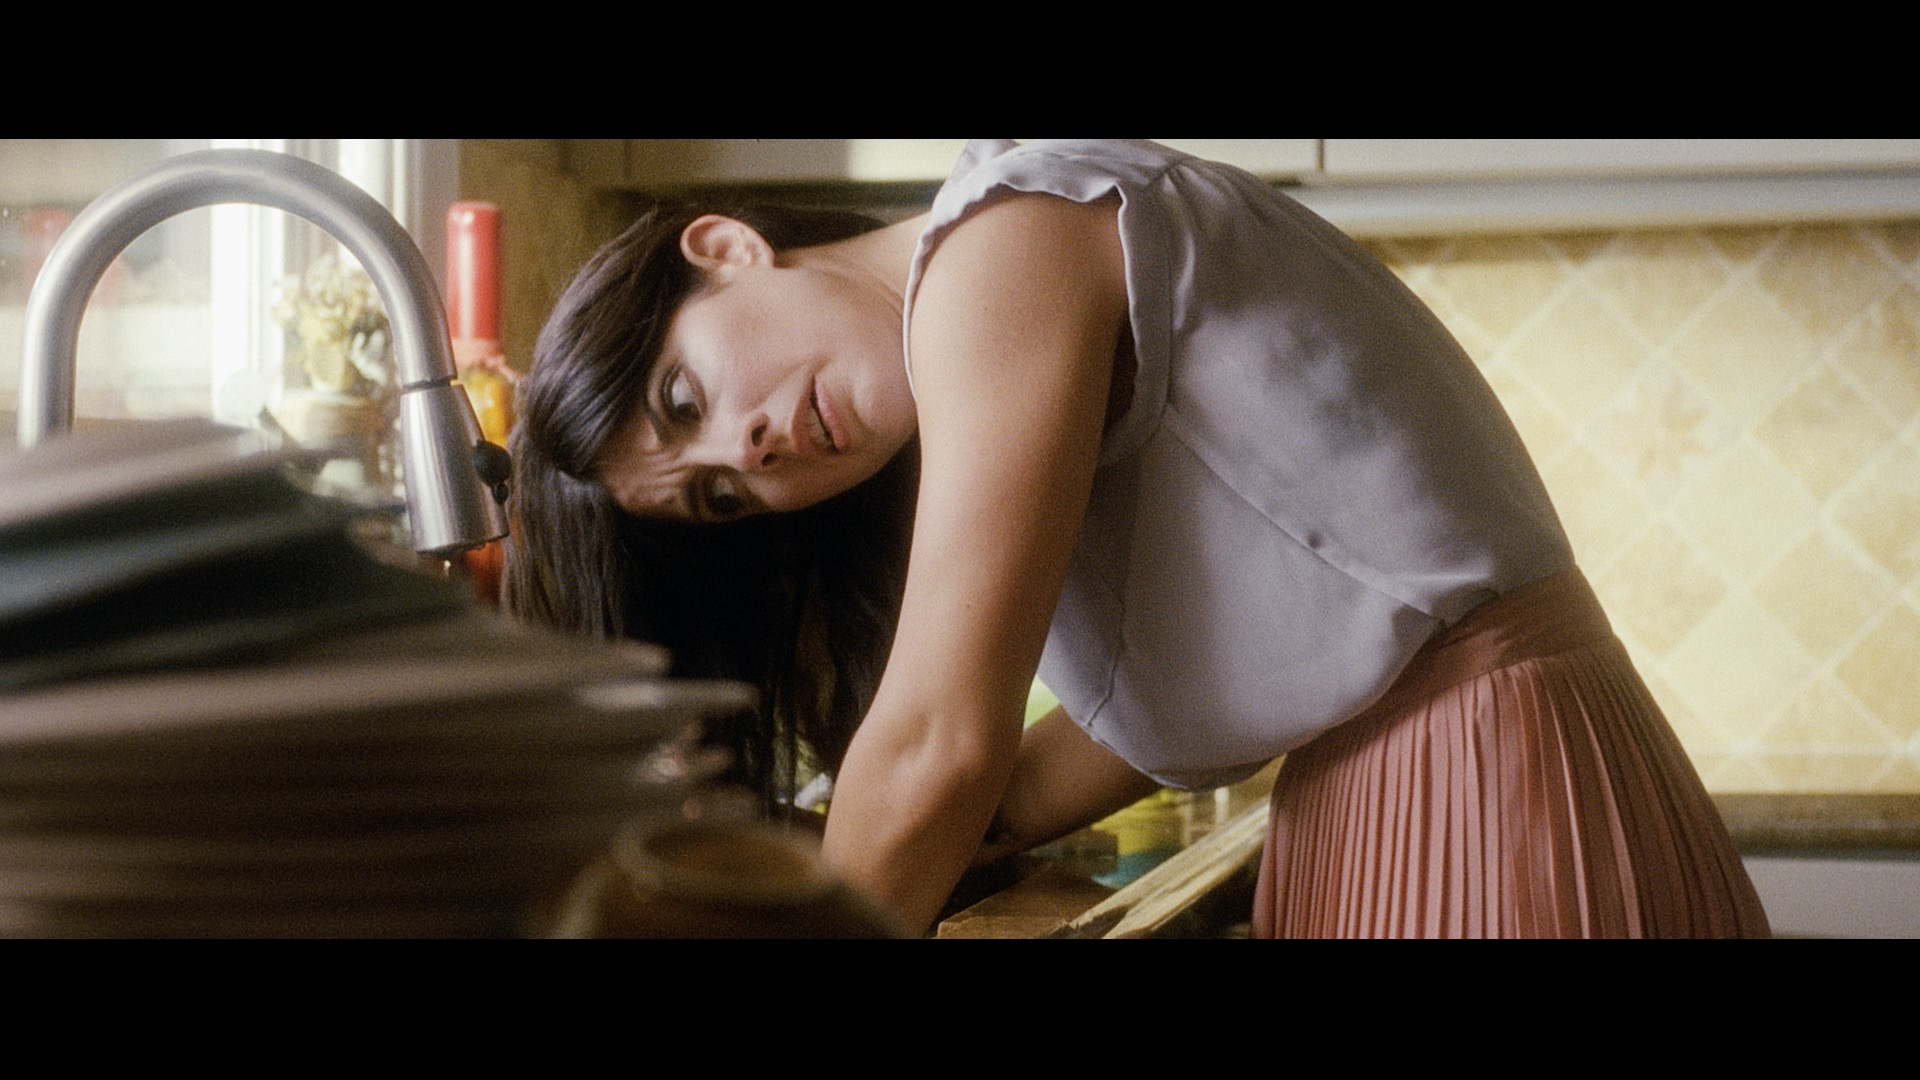 Cristina Fernandez in Kitchen (2015)